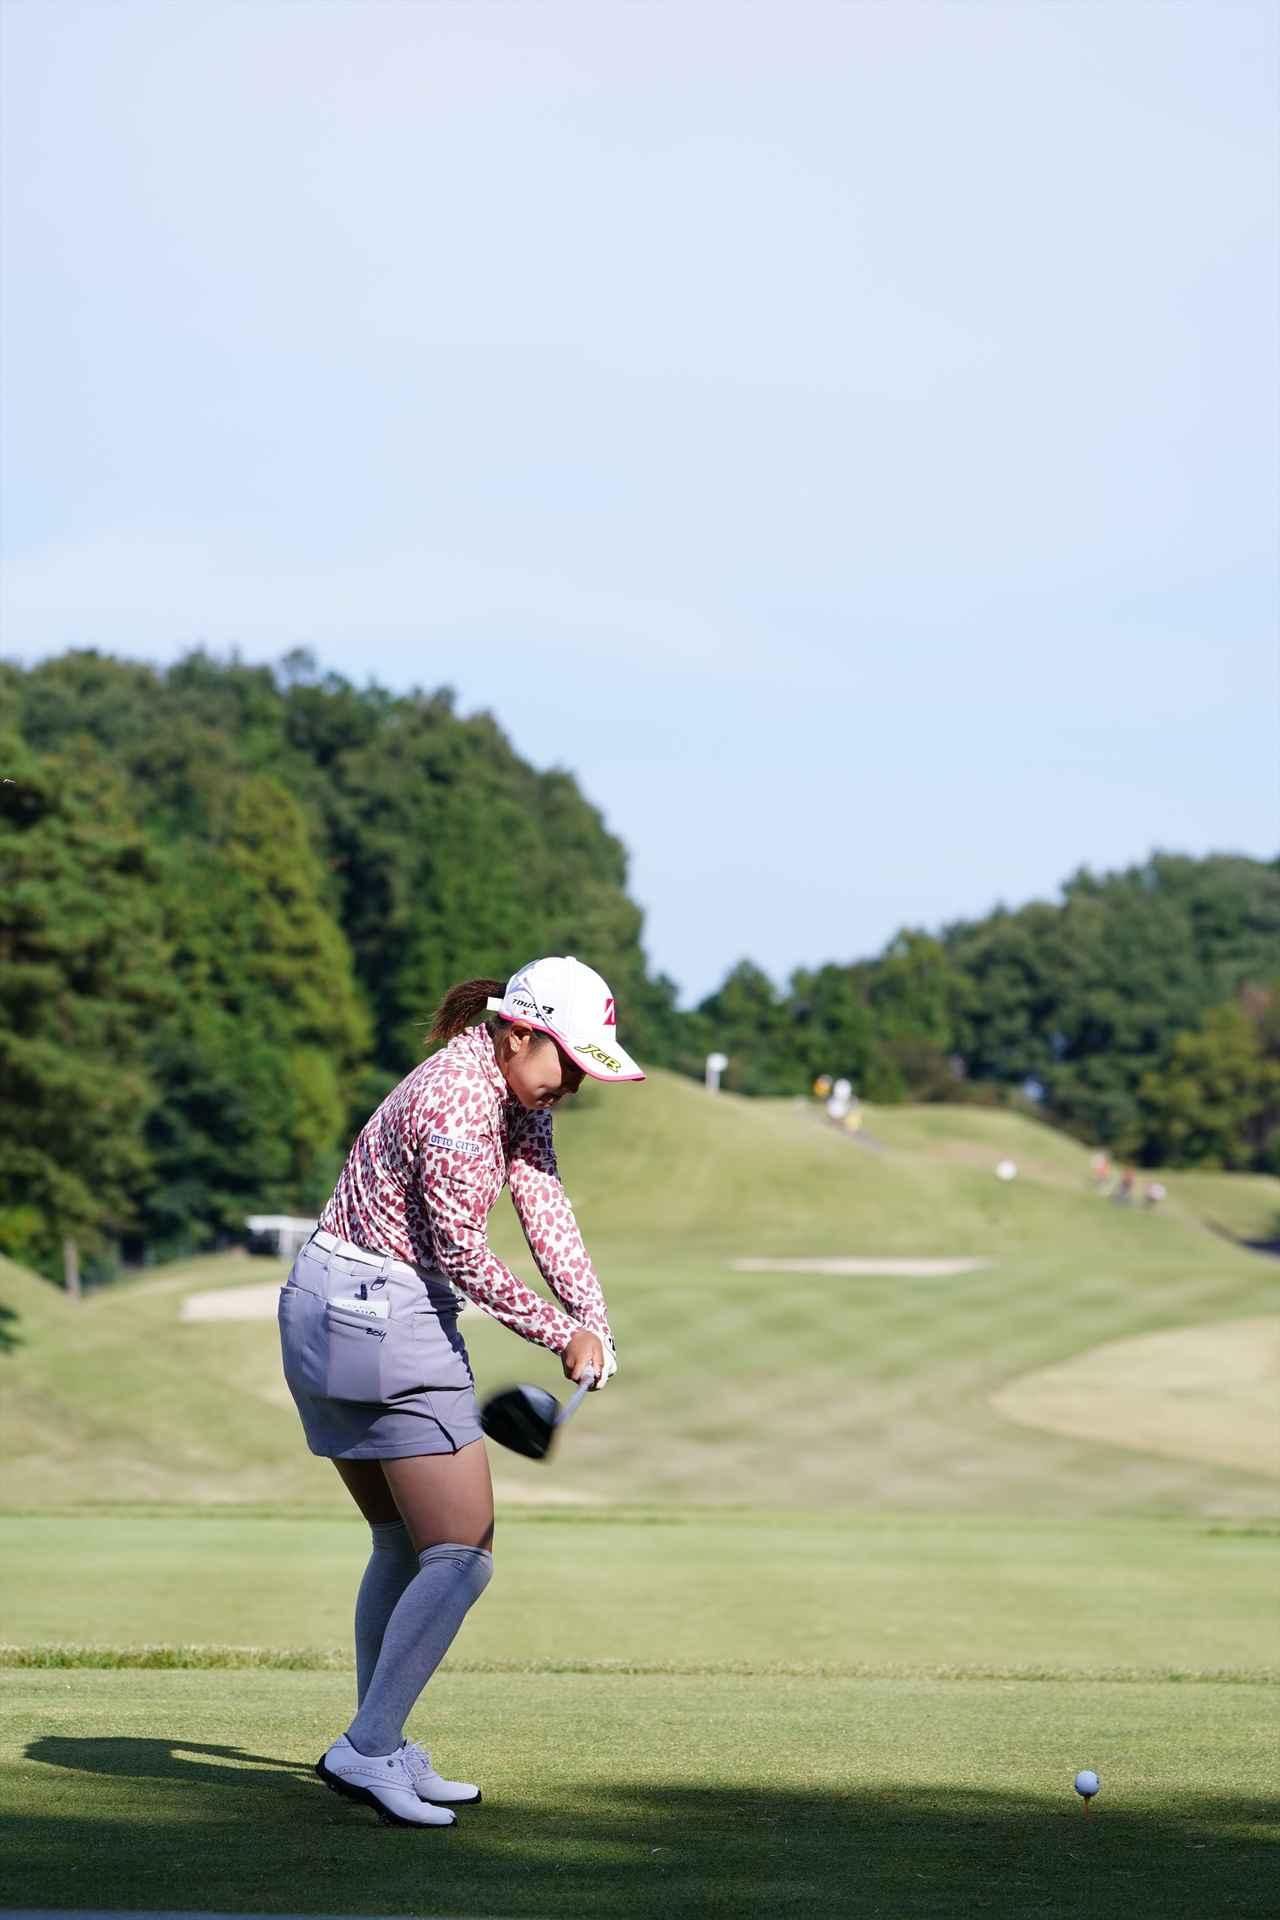 Images : 10番目の画像 - 高木優奈 ドライバー後方連続写真 - みんなのゴルフダイジェスト